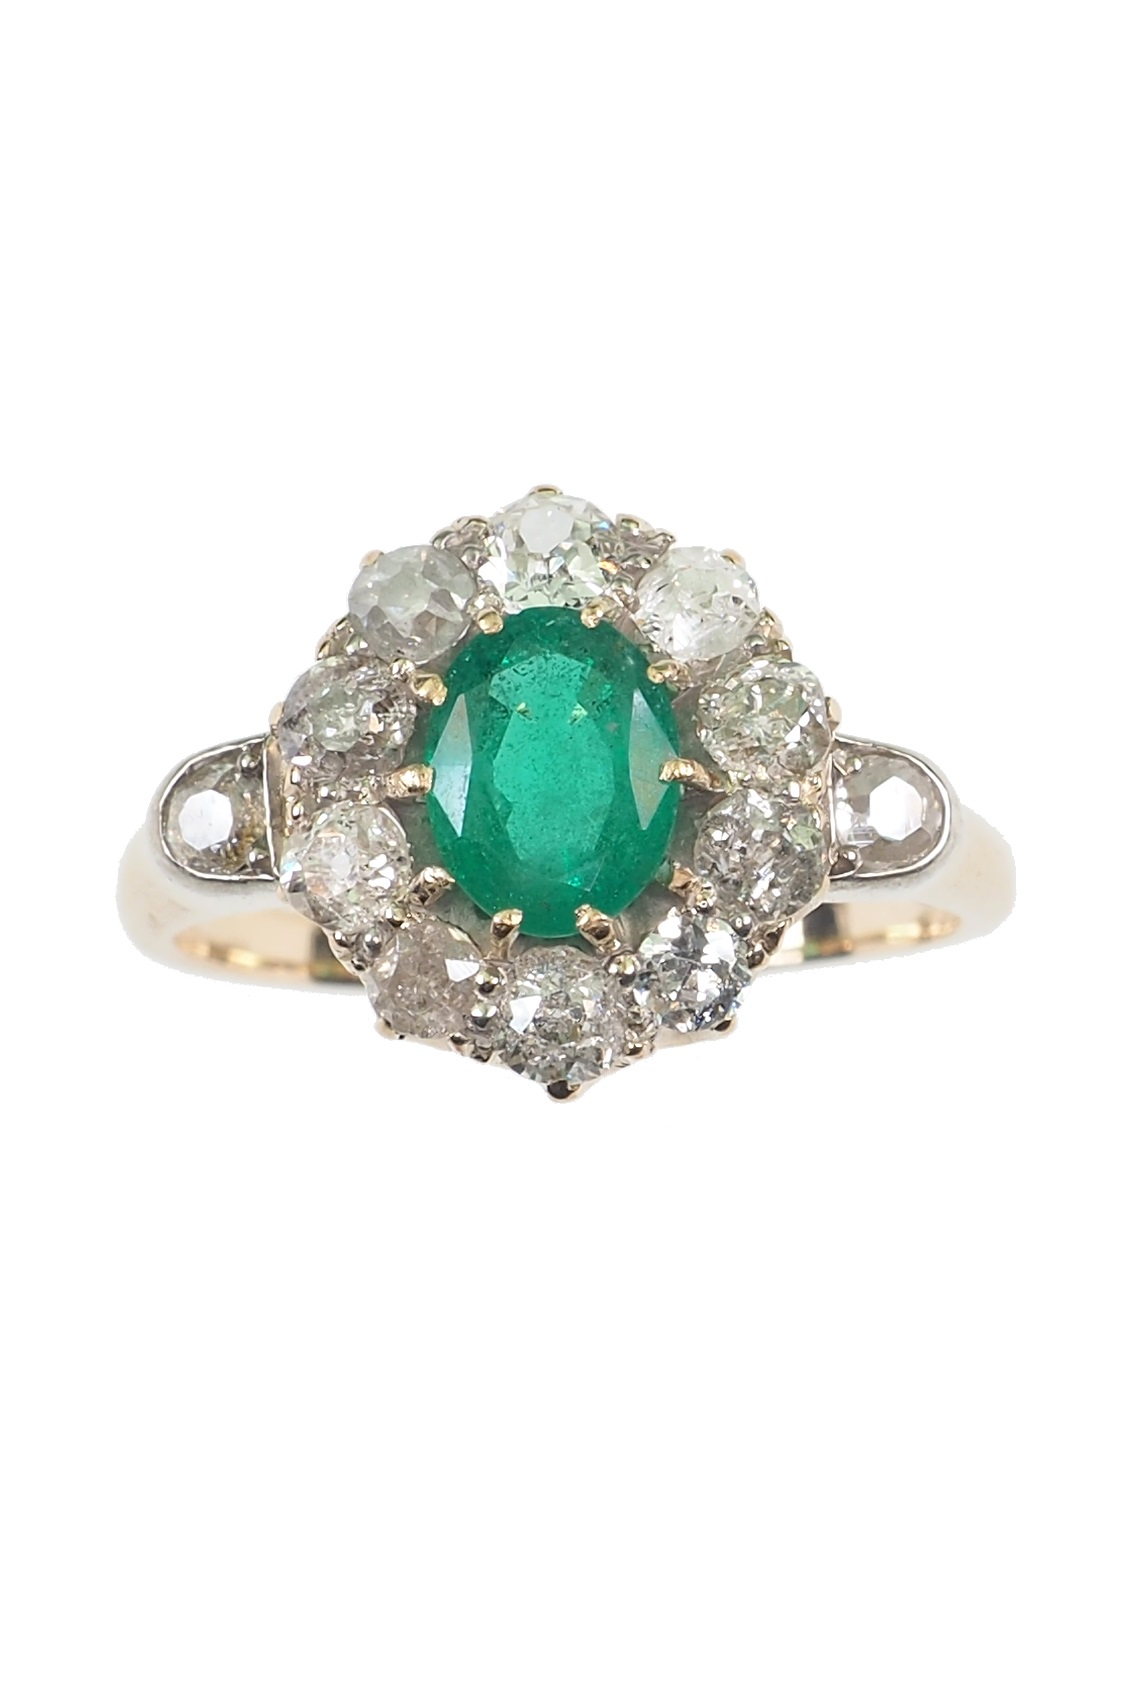 Smaragdring-online-kaufen-2523